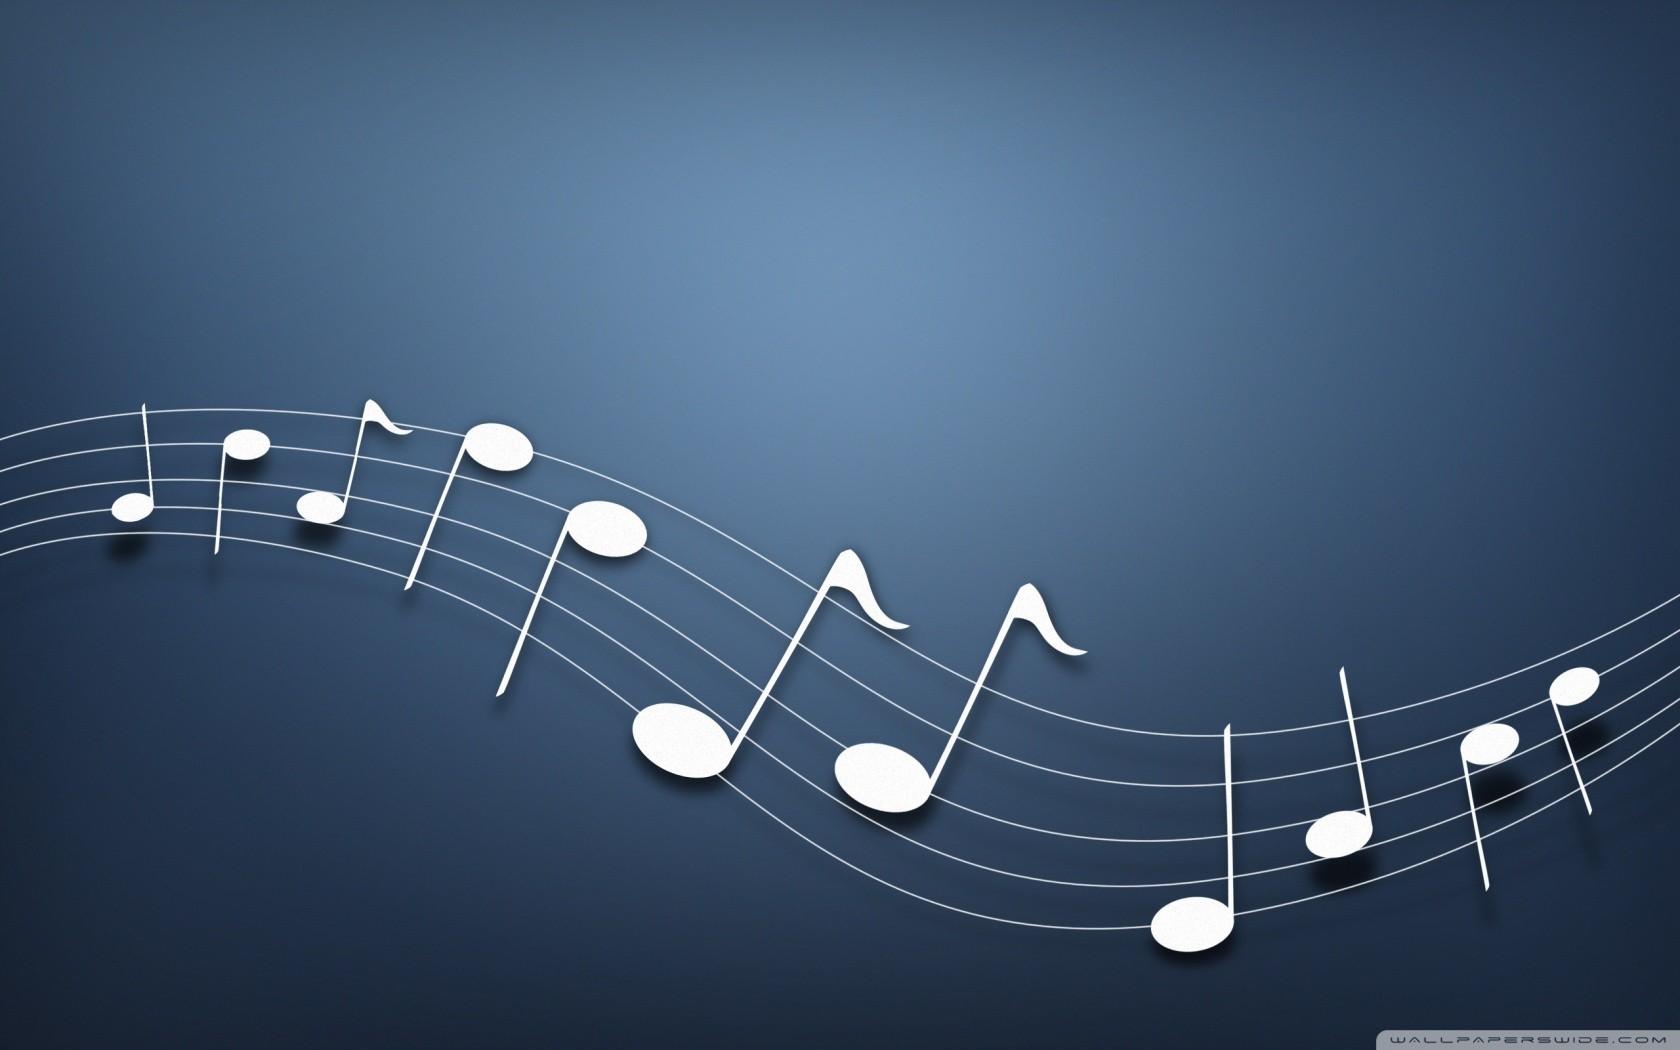 Cute Music Note Wallpaper